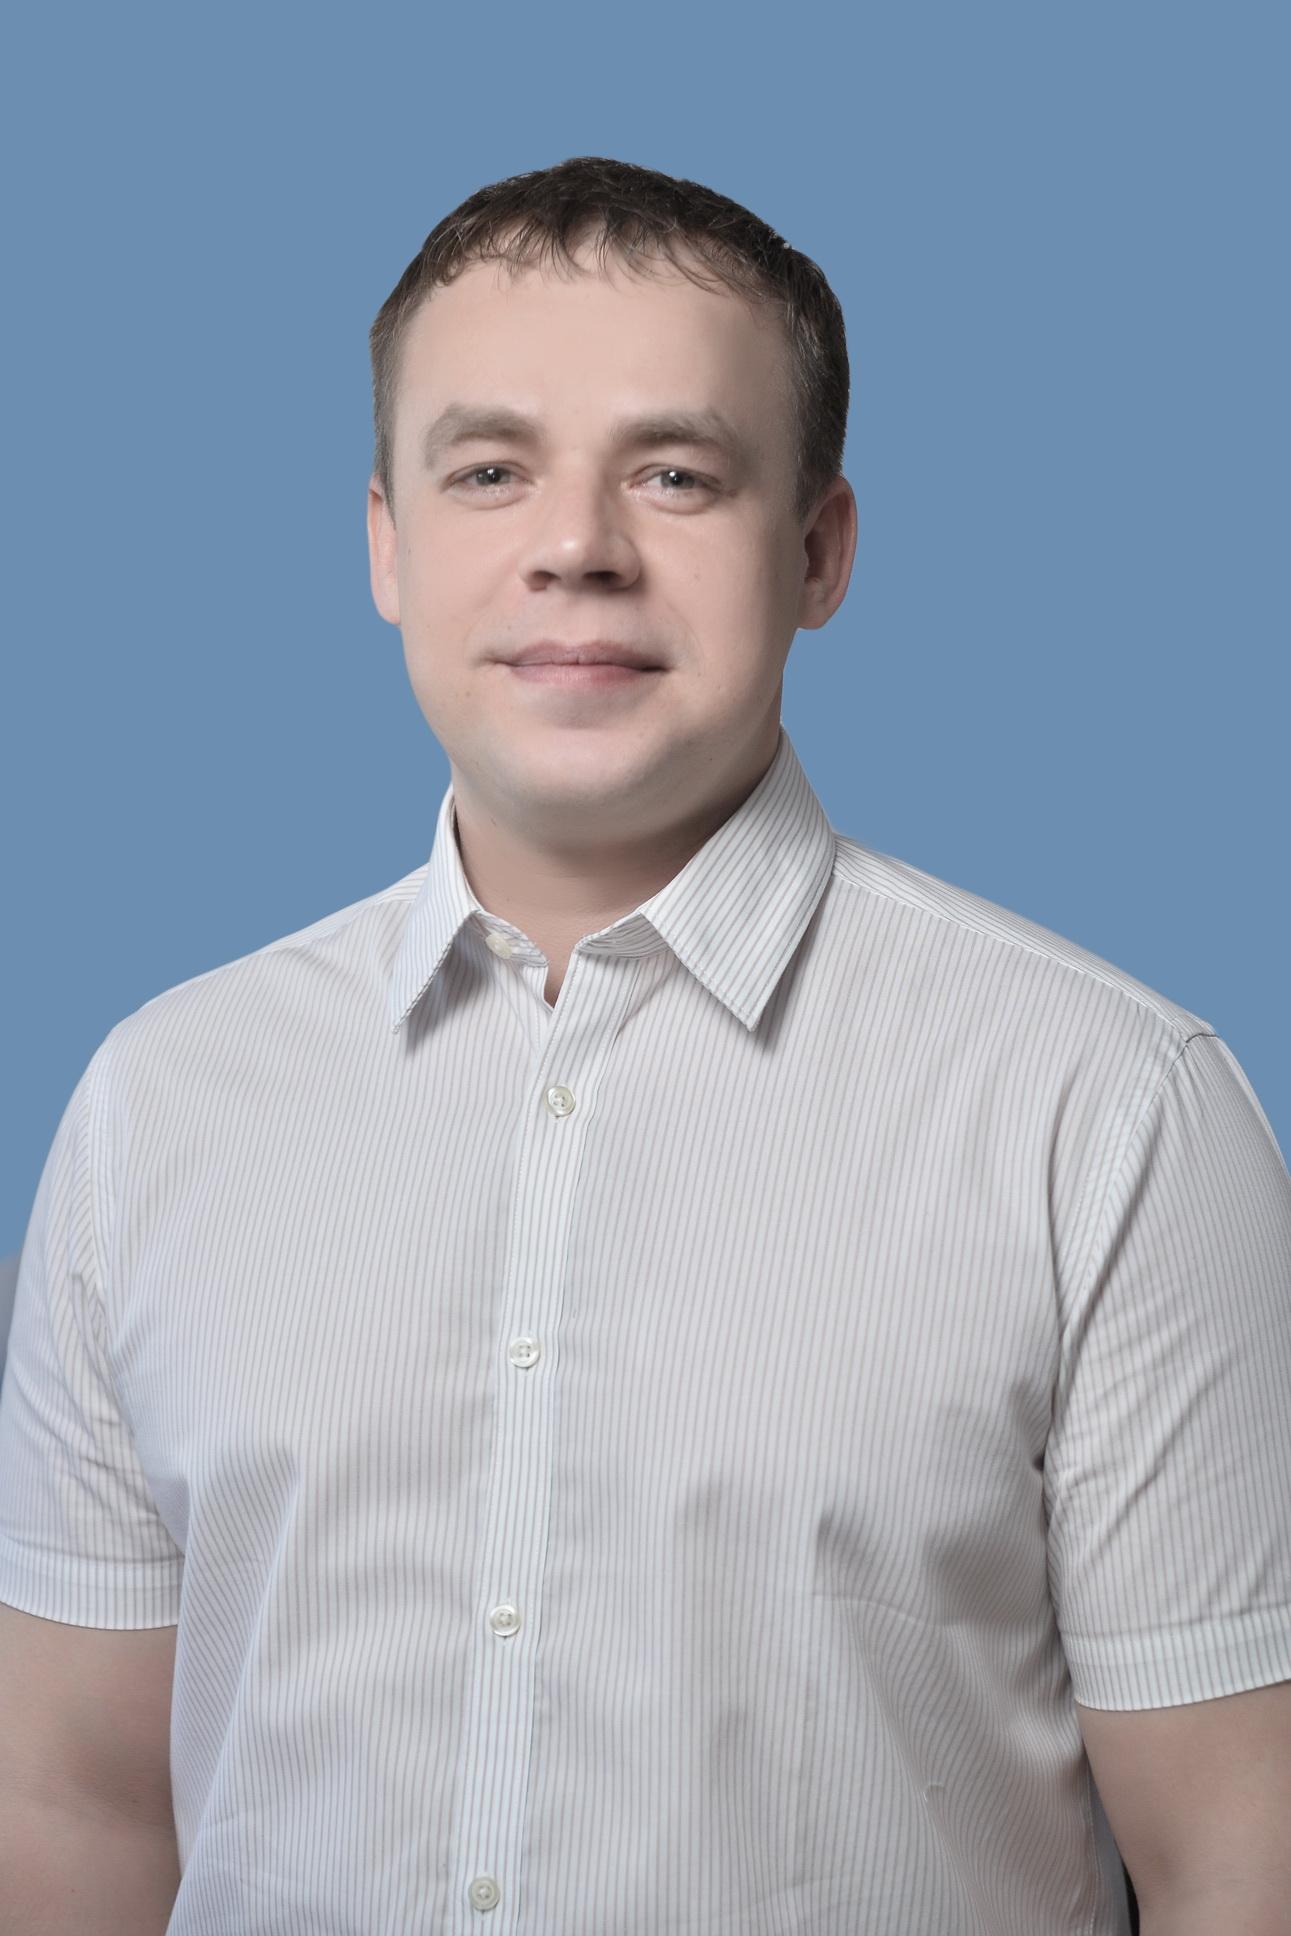 Кардаш Максим Викторович